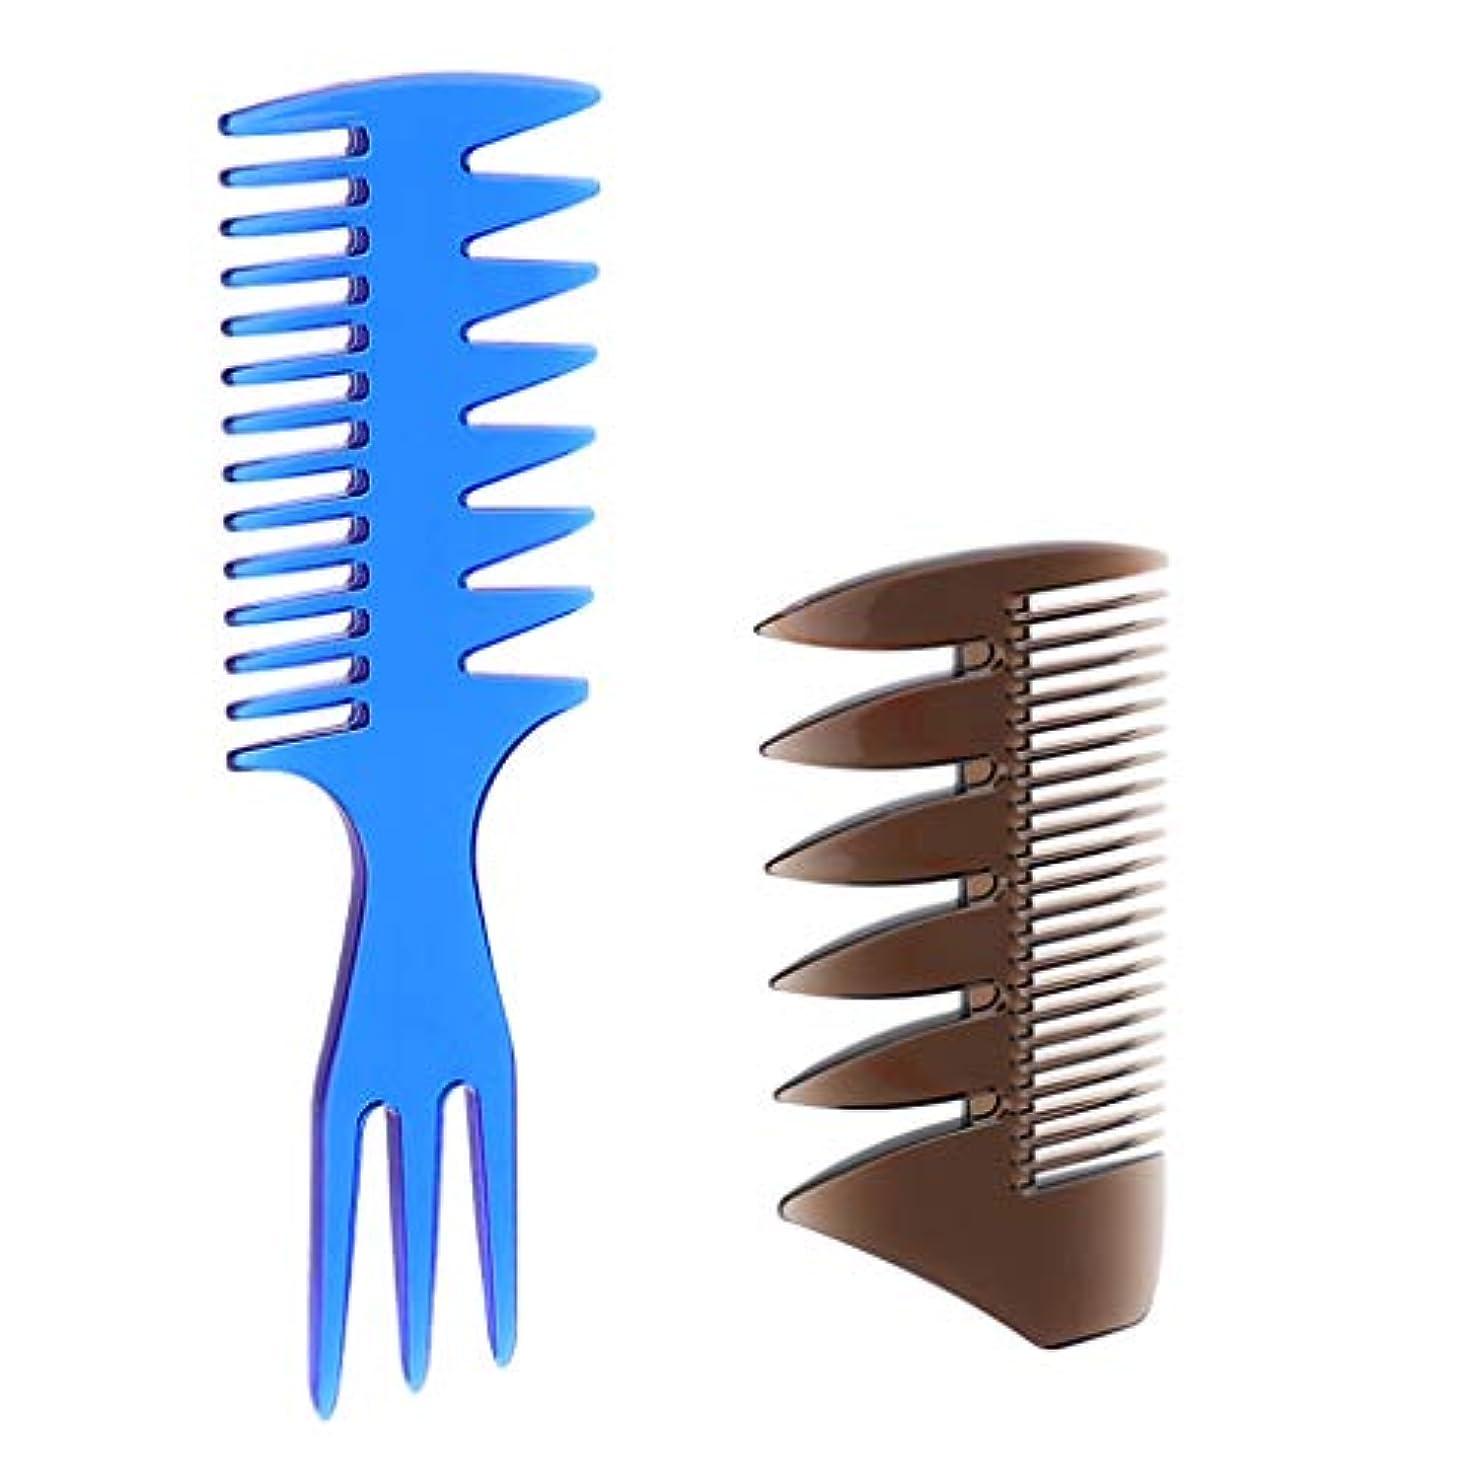 Sharplace 広い歯櫛 コーム 3-in-1櫛 2-in-1櫛 ヘアサロン ヘアブラシ